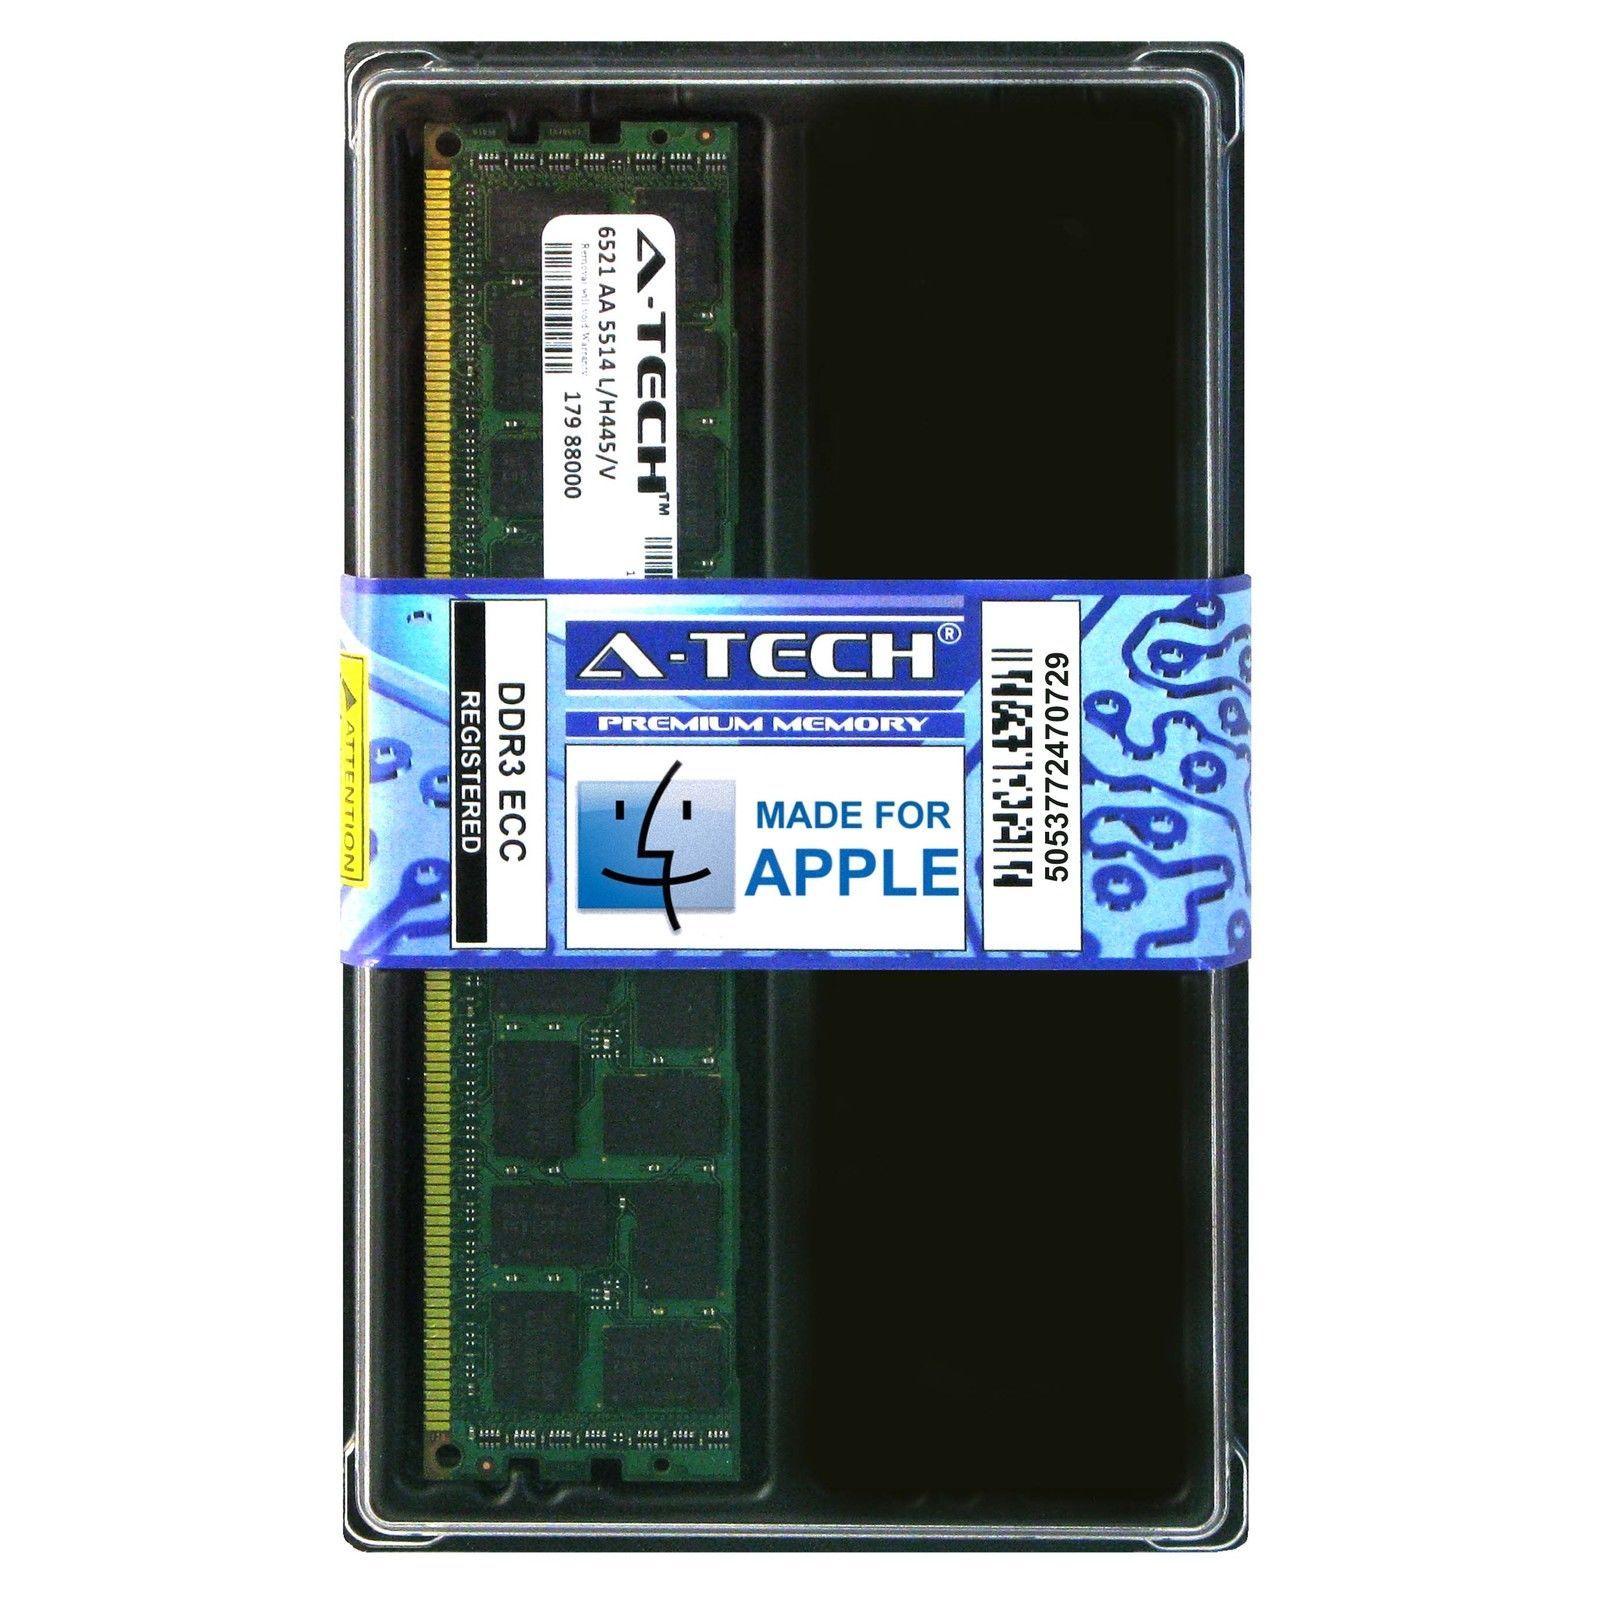 ATech Components Ram Memory ebay Electronics Mac pro